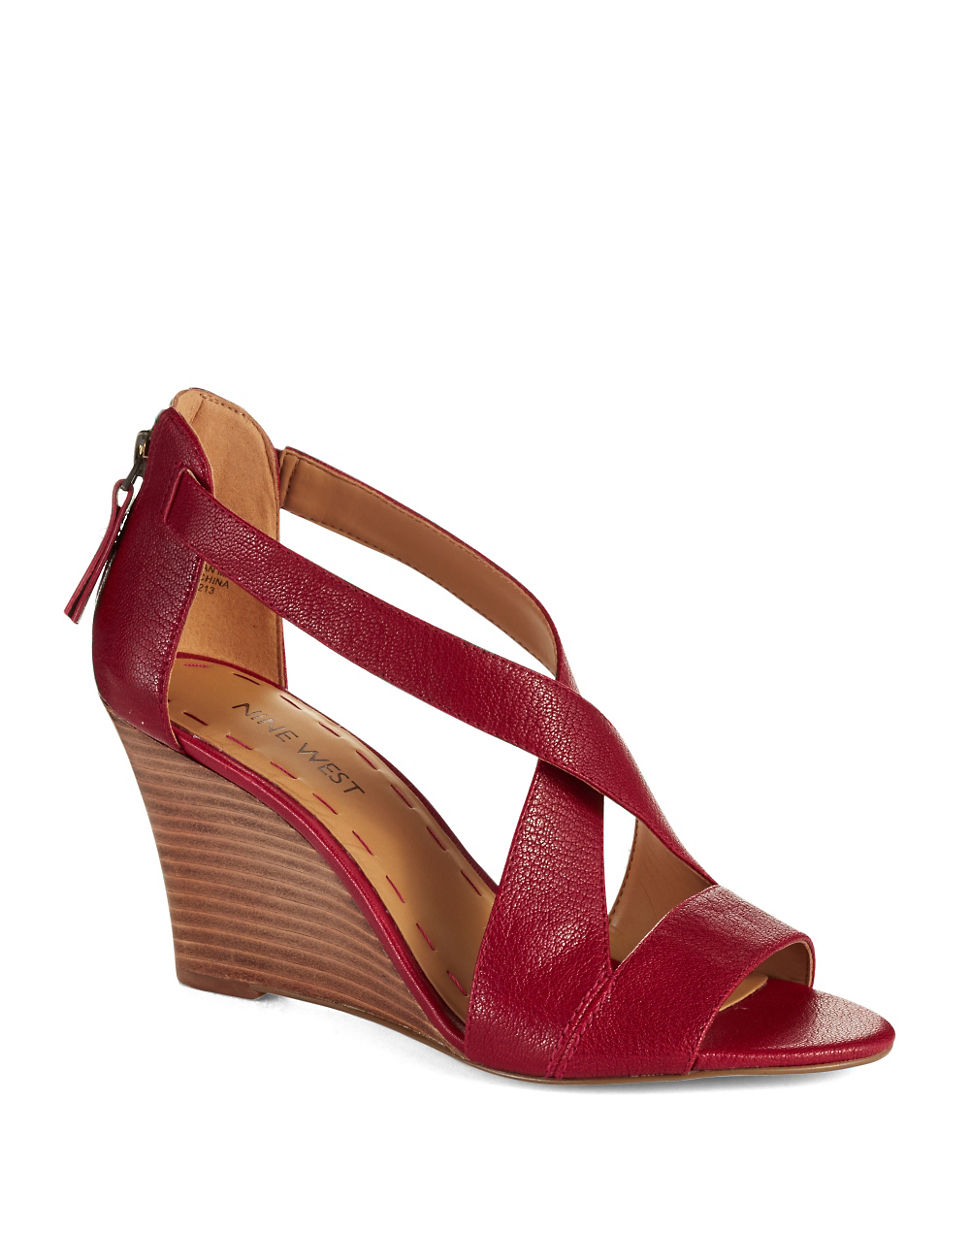 Nine West Dress Shoes